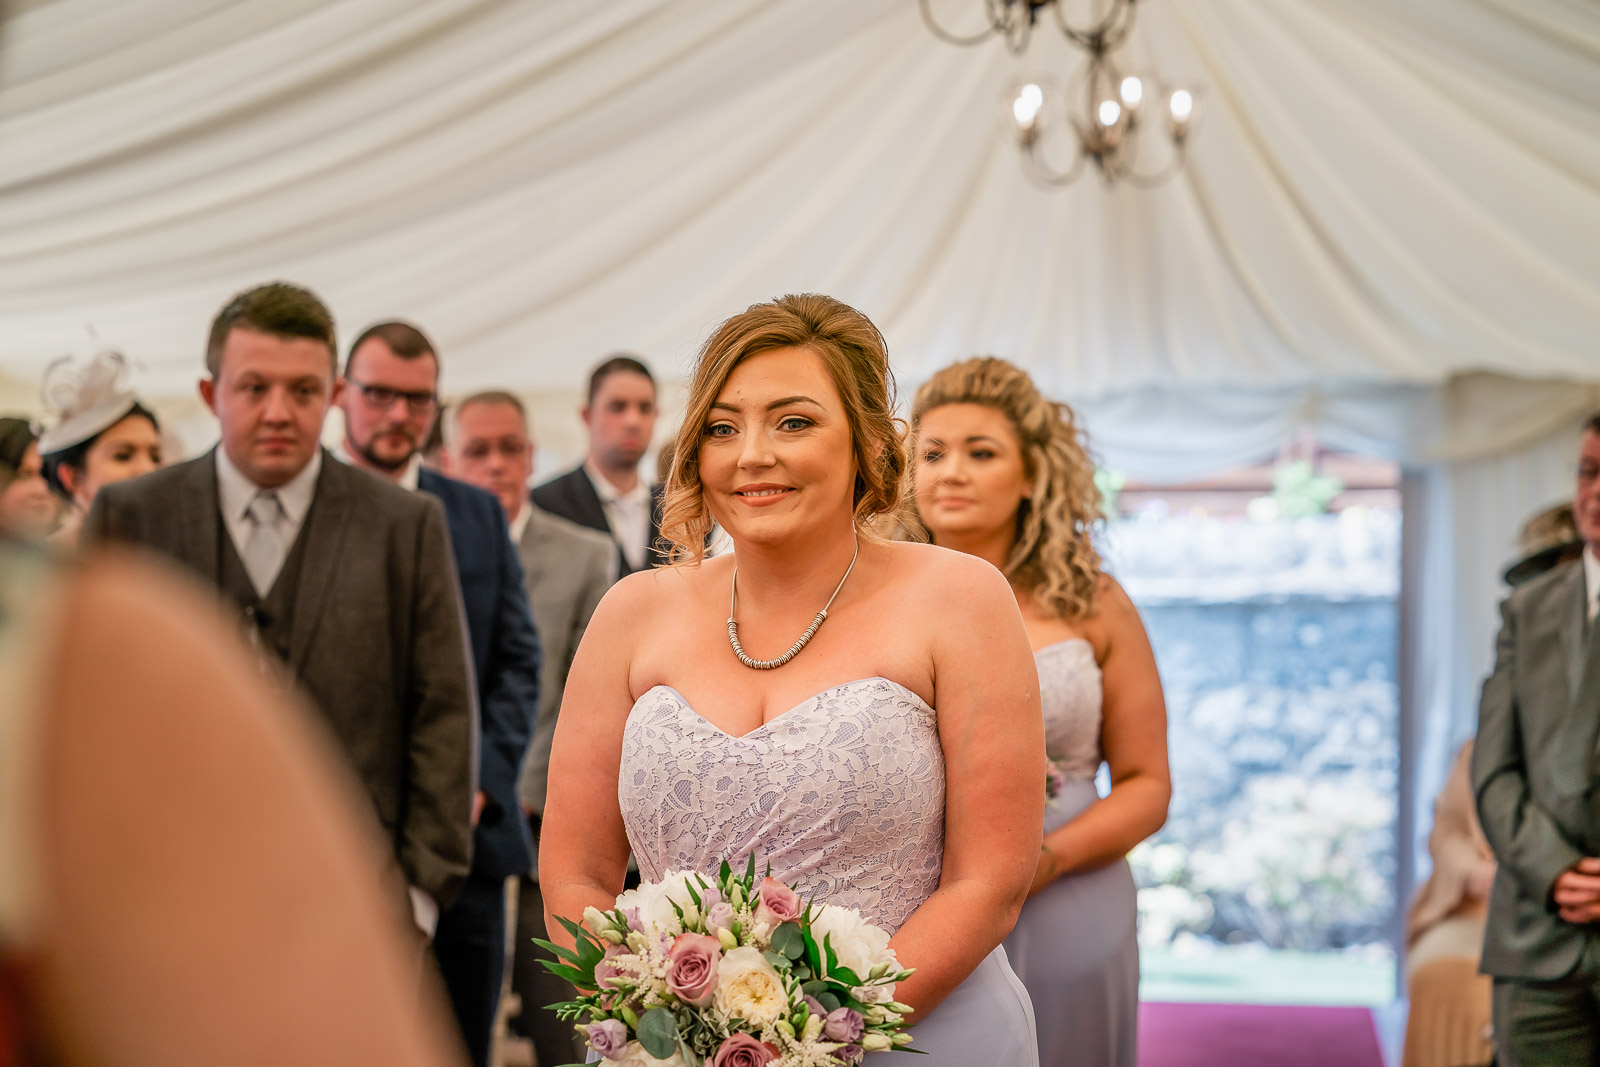 cornhill_castle_wedding_biggar_dearlyphotography (82 of 448).jpg